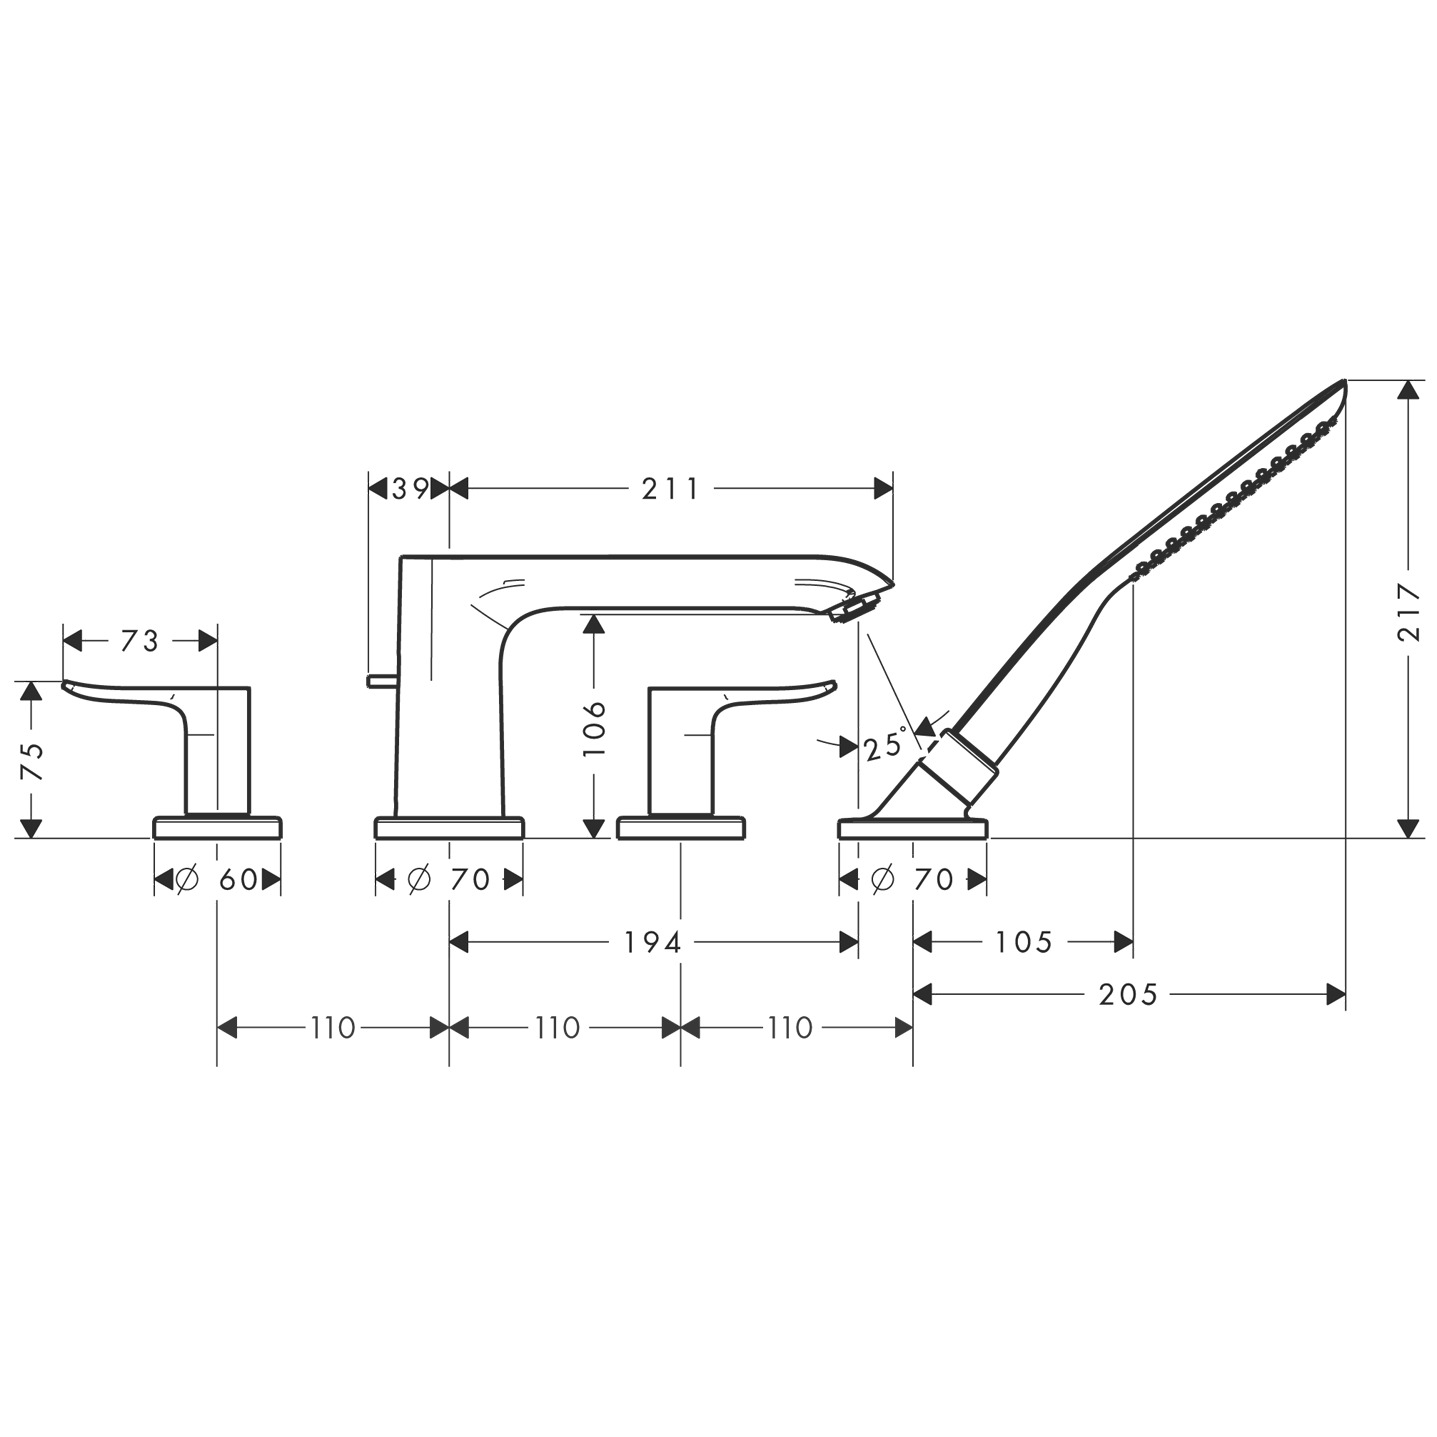 31442000 Metris 4 hole rim mounted bath mixer